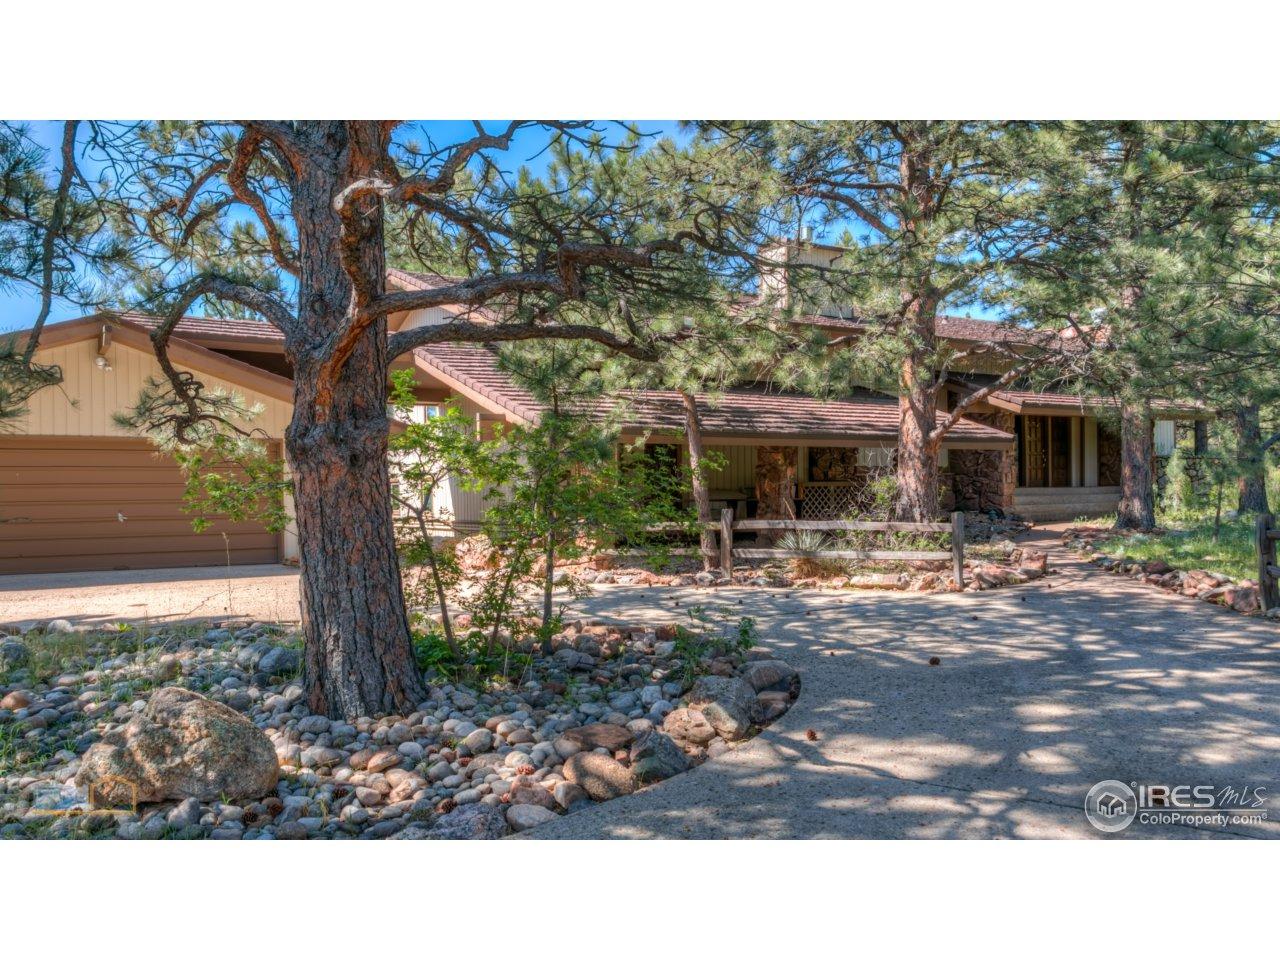 2828 S Lakeridge Trl, Boulder CO 80302